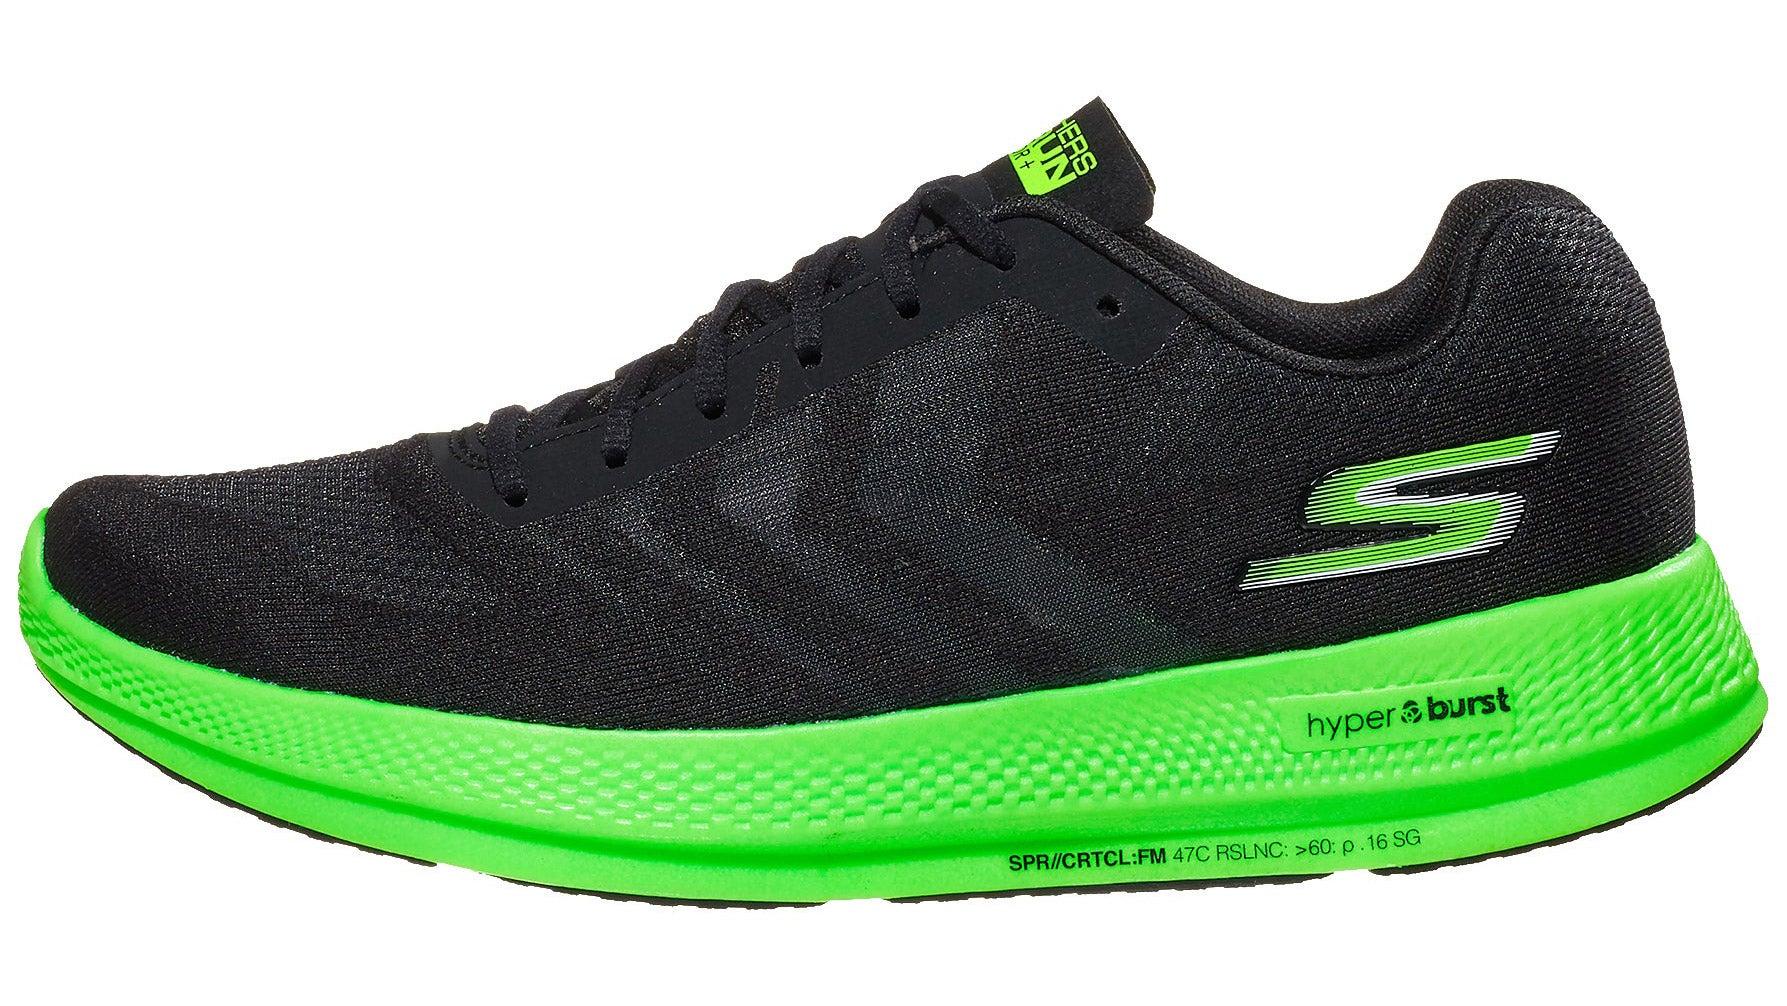 Black and neon green Sketchers GOrun Razor + Hyper